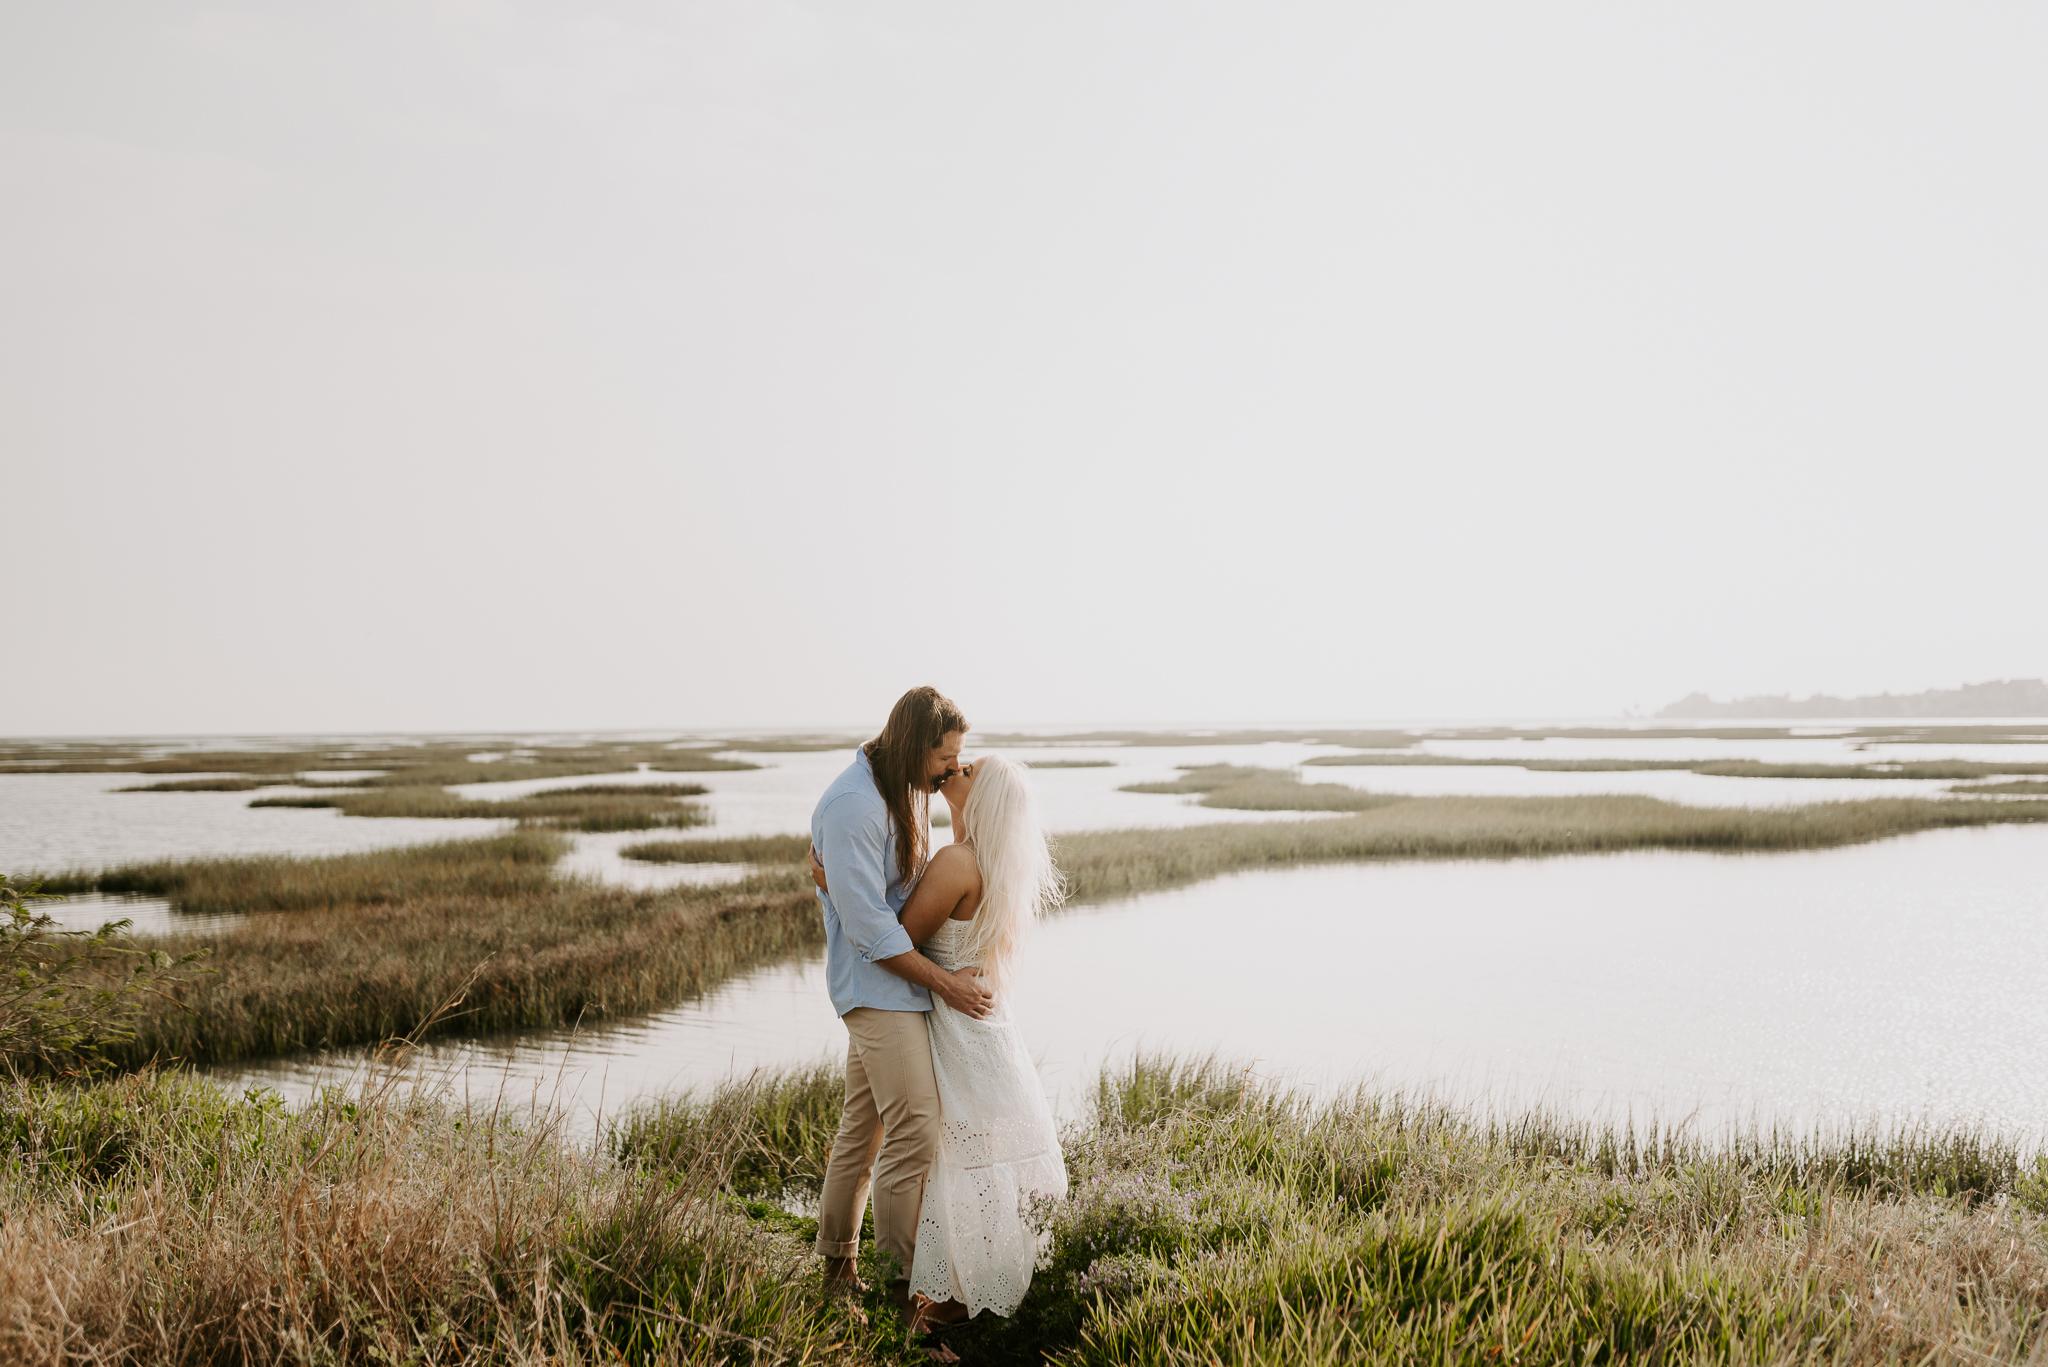 Ashley + Charles - Galveston Texas Moody Engagement Session | Kristen Giles Photography - 007.jpg